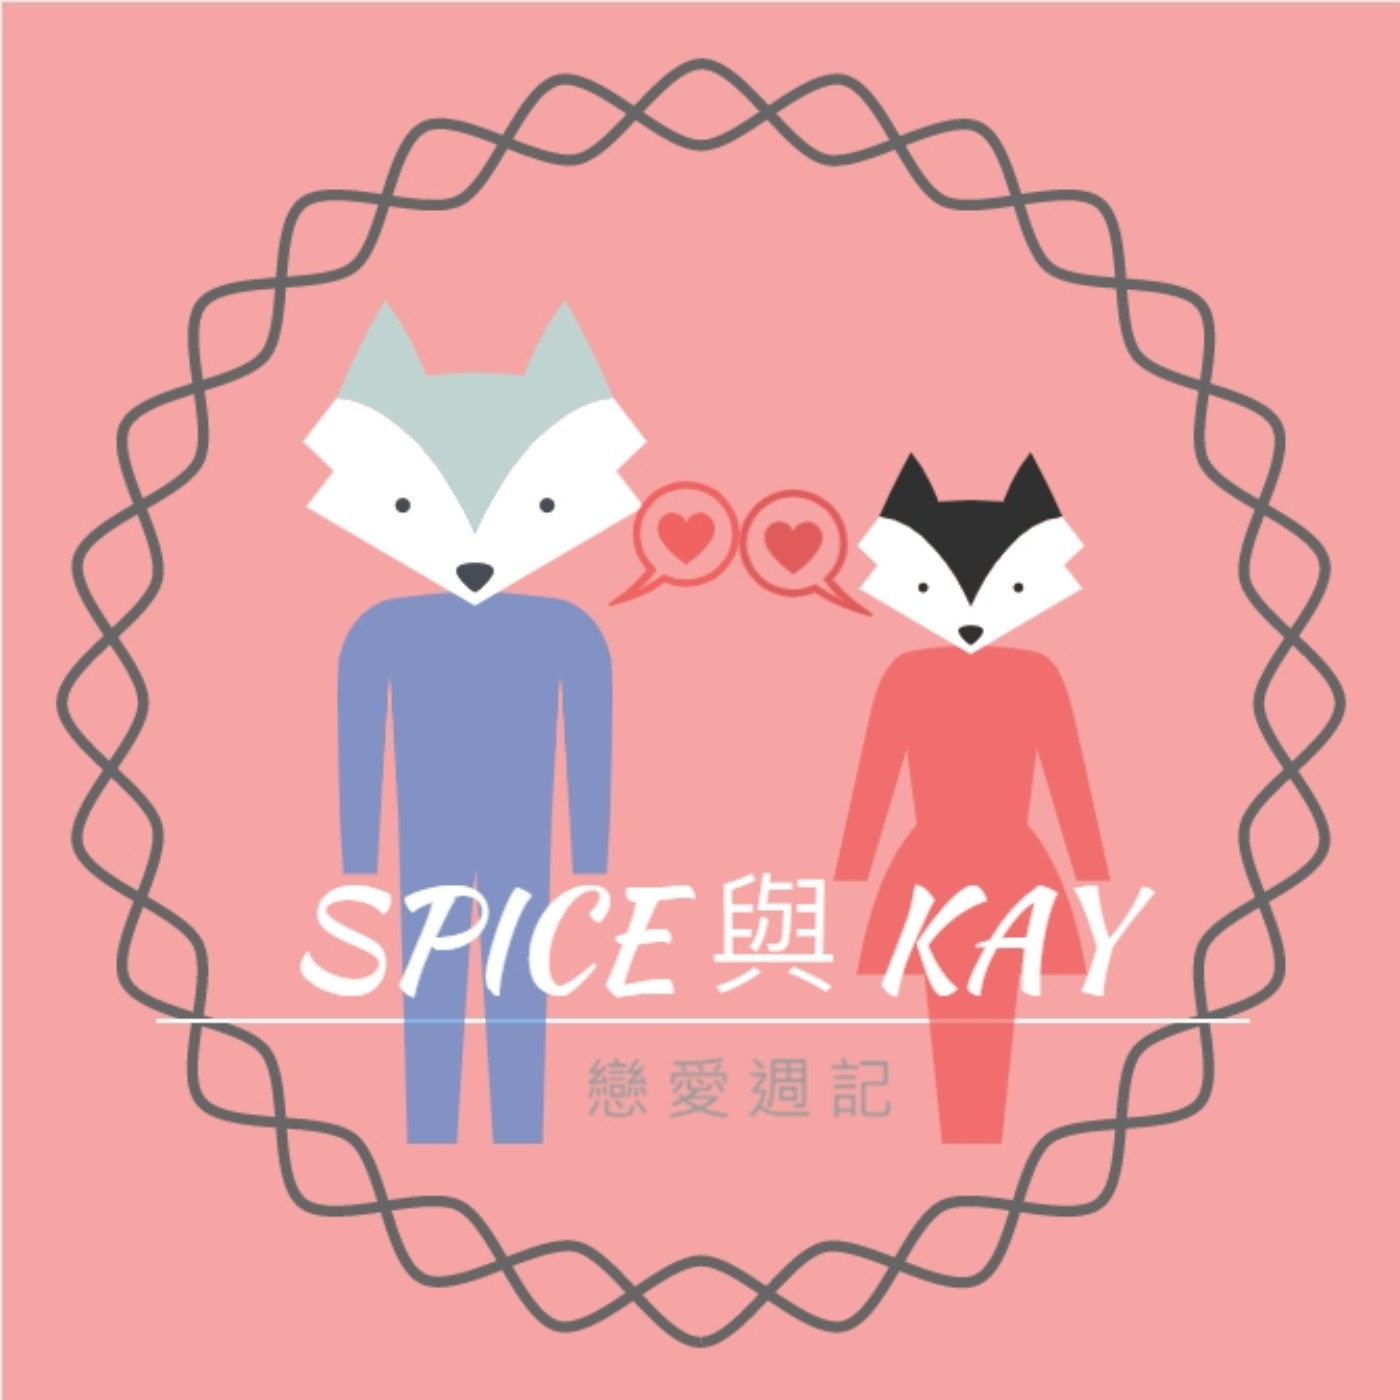 SPICE與KAY的戀愛週記